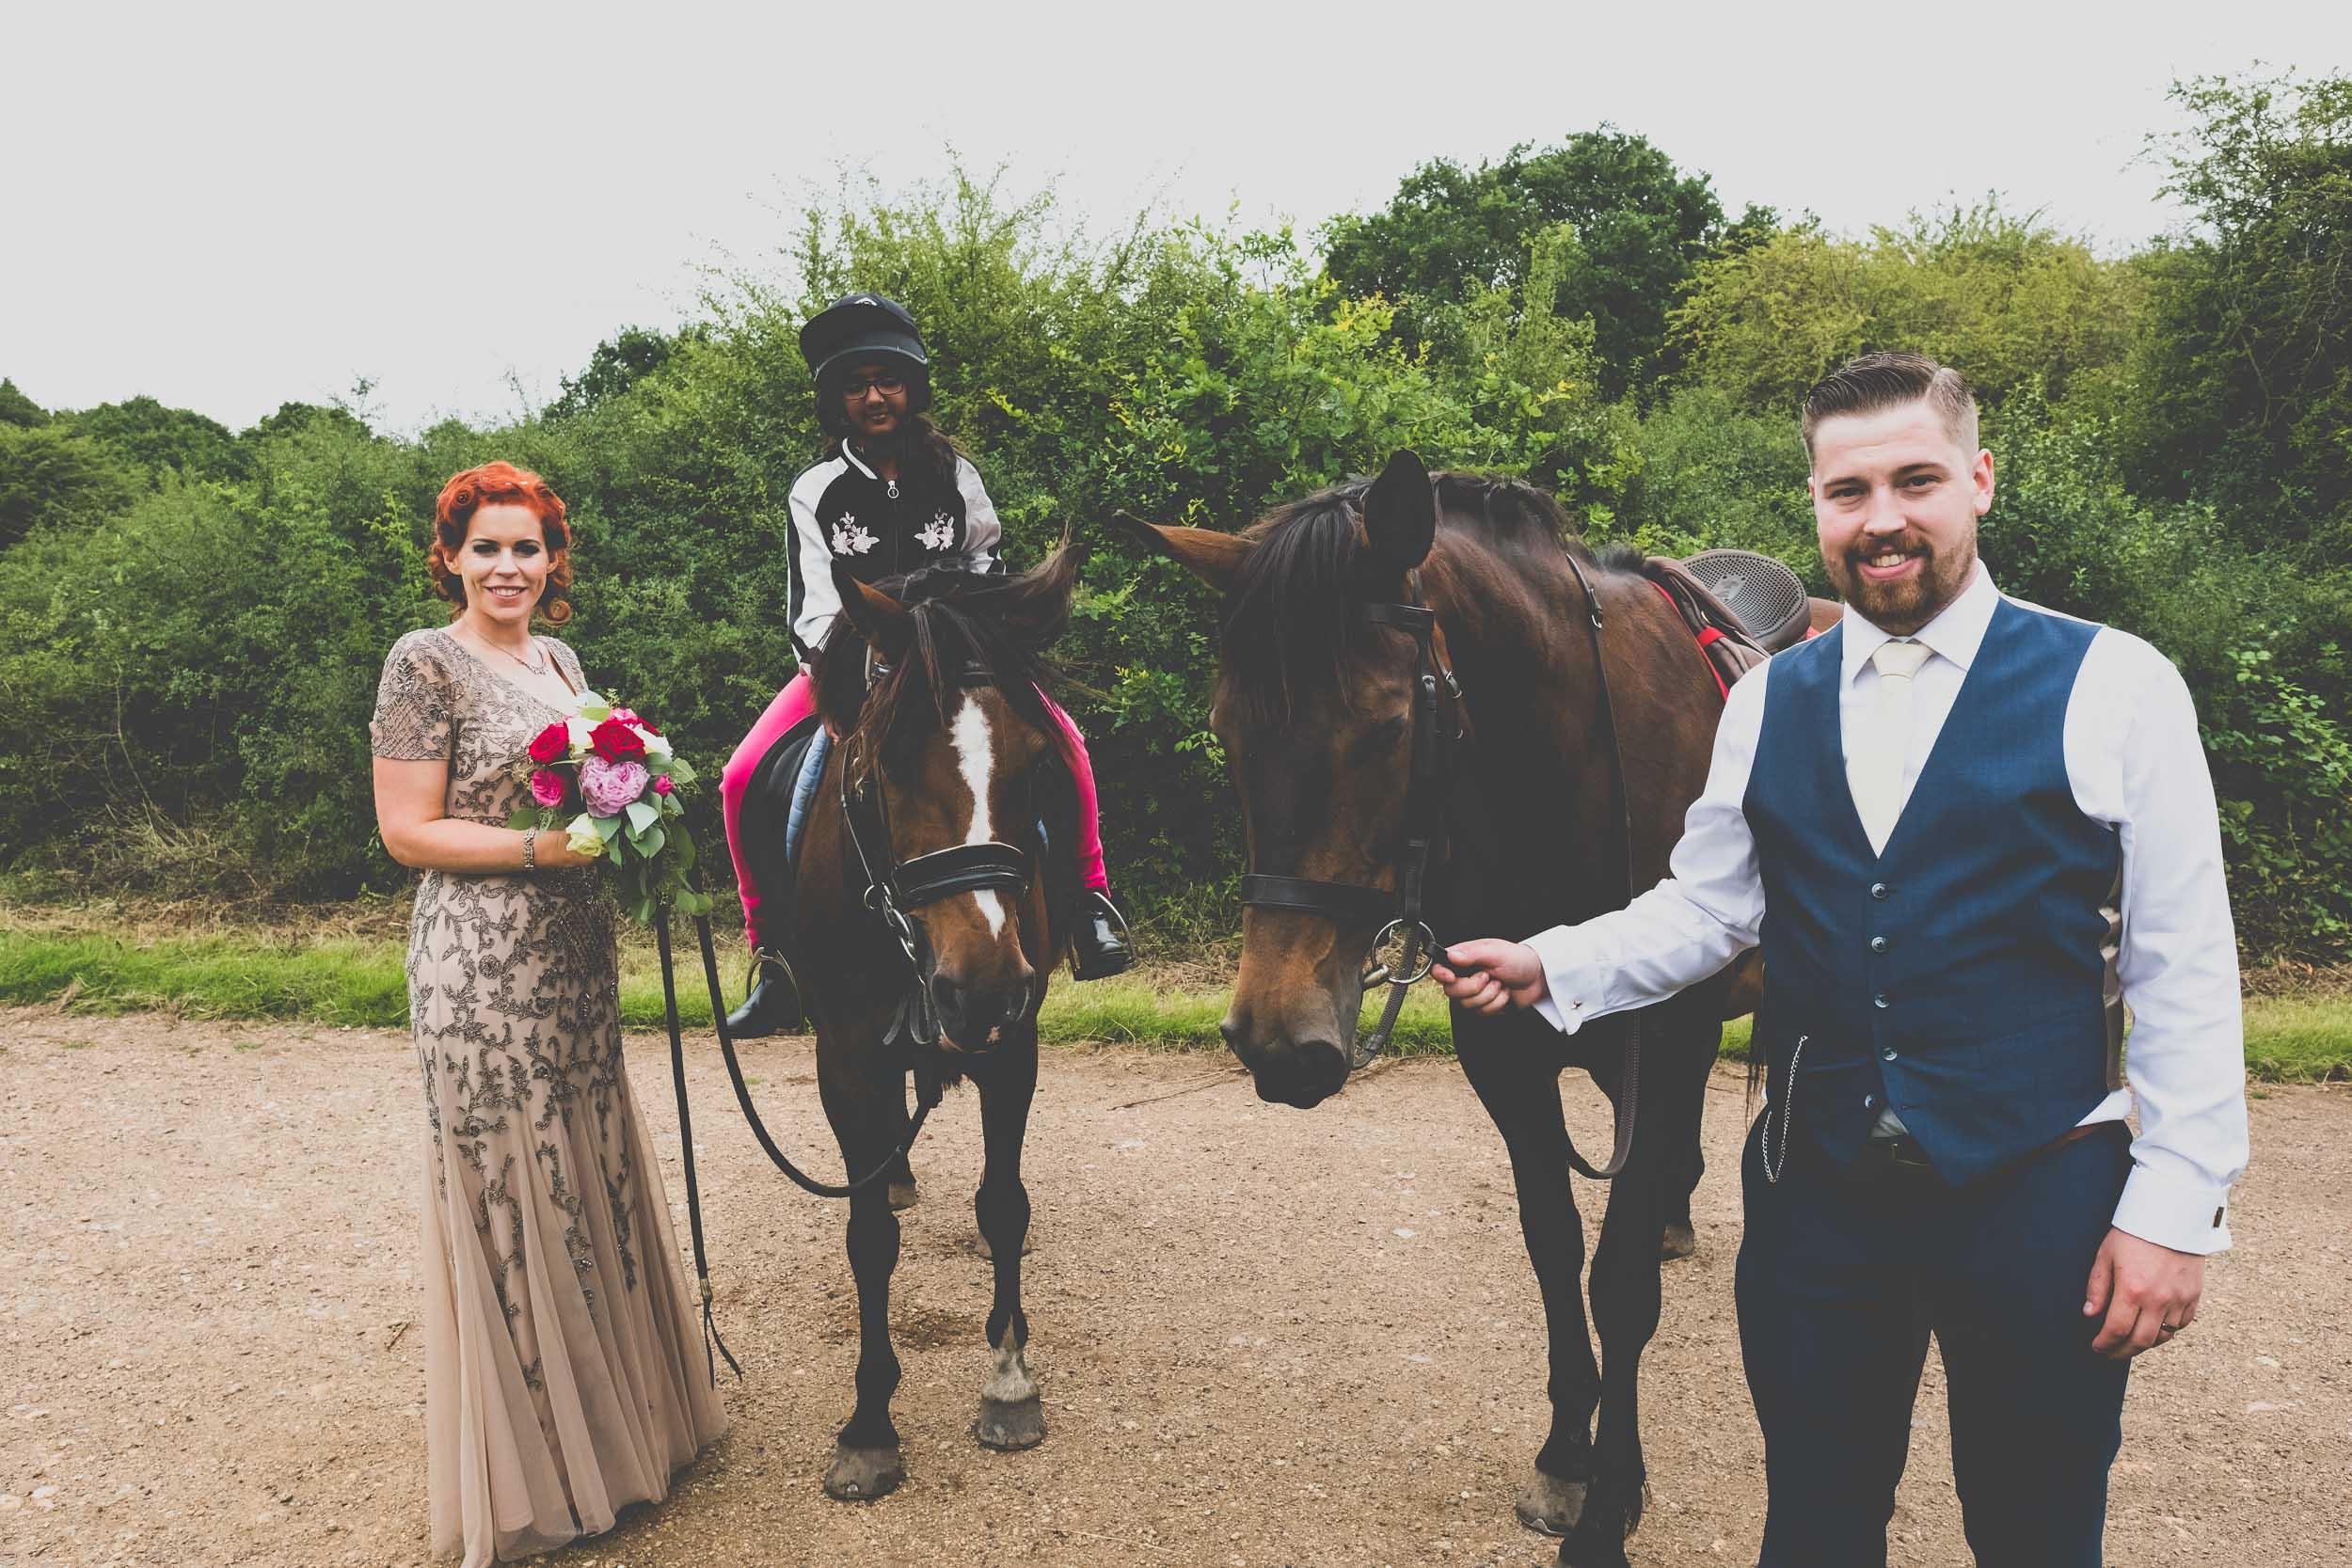 queen-elizabeths-hunting-lodge-epping-forest-wedding251.jpg